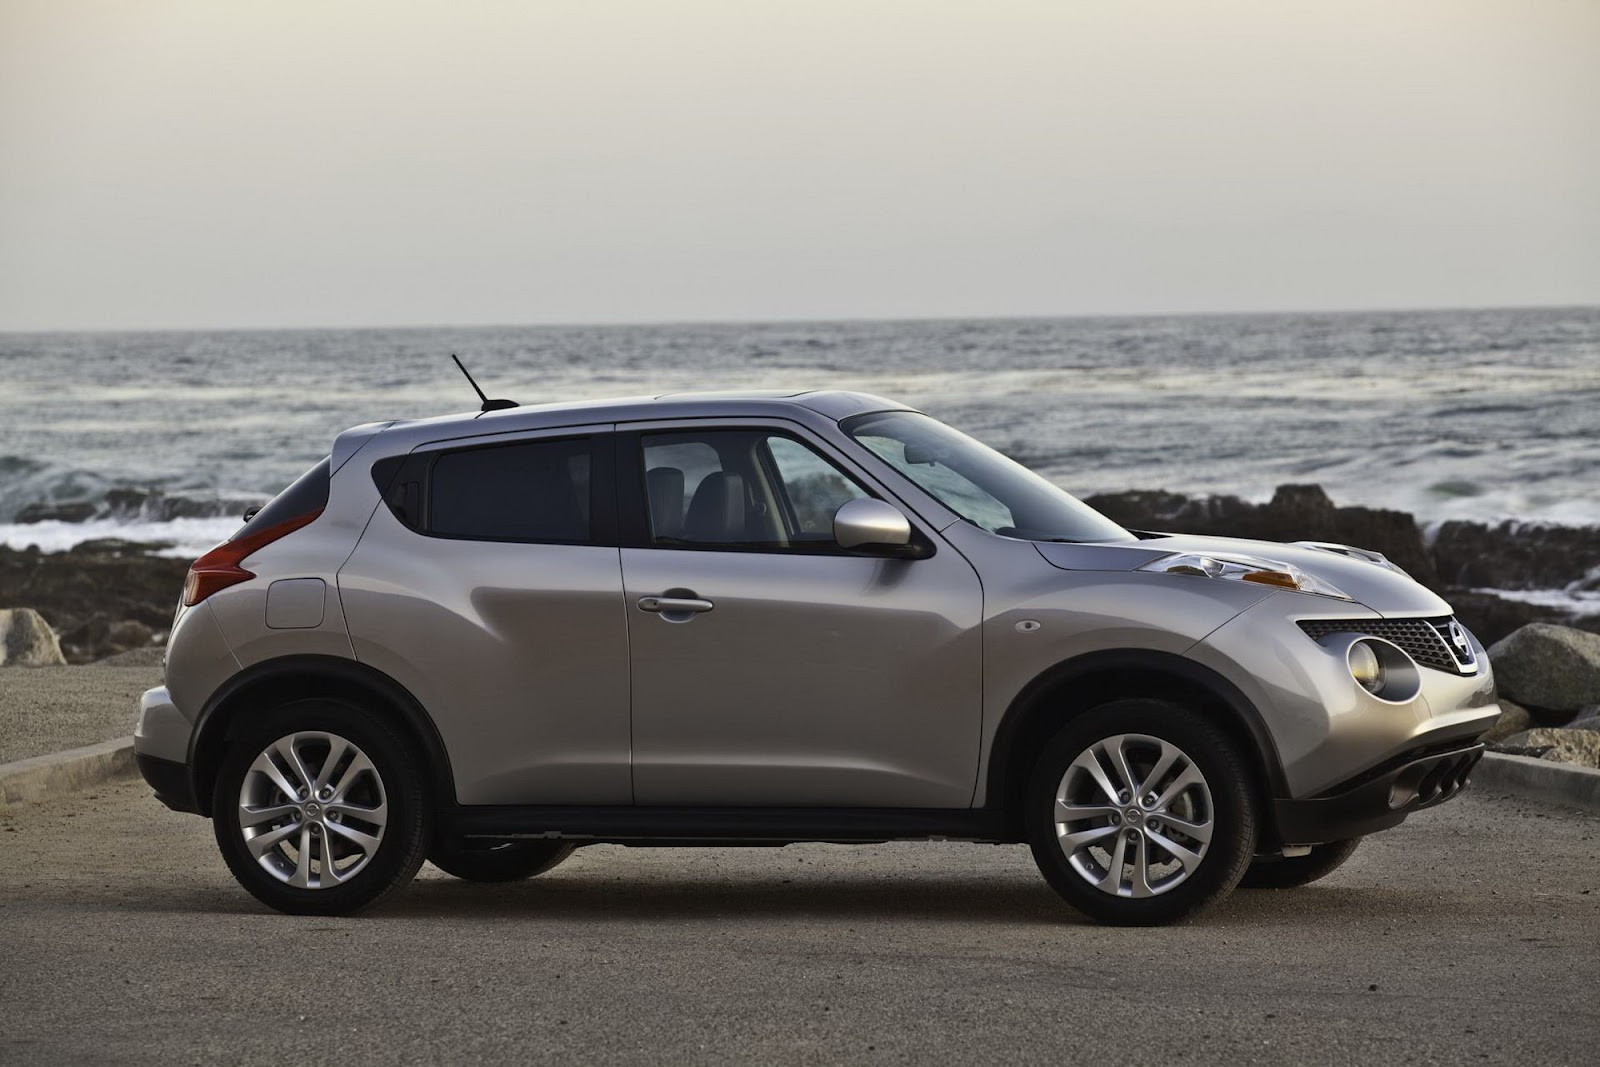 Nissan Juke Sport Car HD Wallpapers Part.1 | Best Cars HD ...